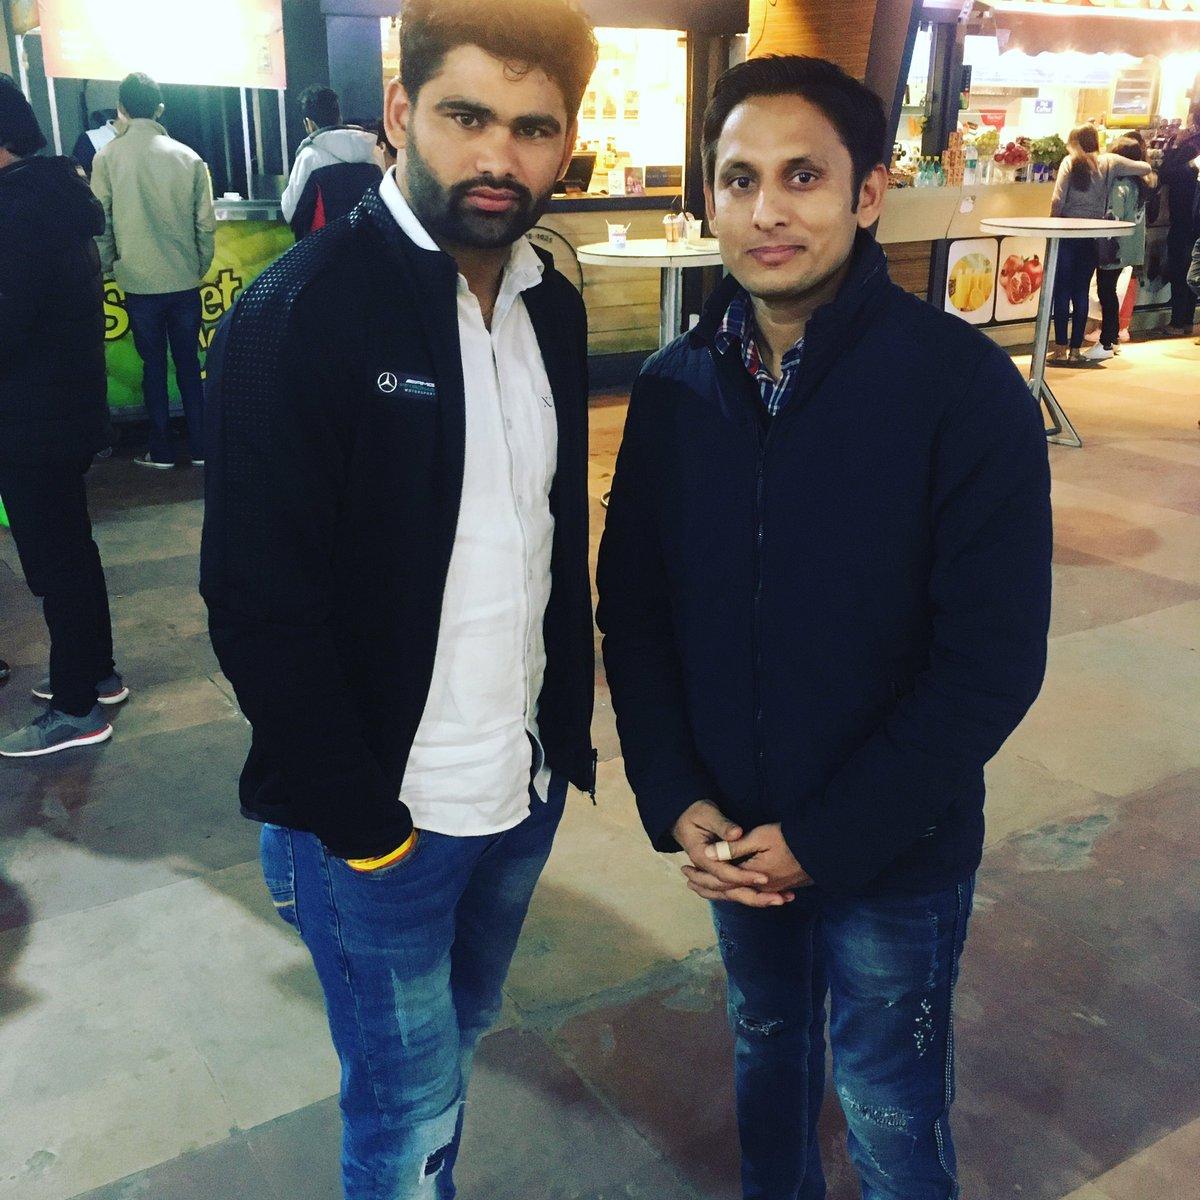 @juniorbachchan @republic_sports @Sports_NDTV @IndiaSports @ProKabaddi @PatnaPirates @JaipurPanthers Glad to meet Mr. Pradeep Narwal ji, #Dubkiman #RoarForPanthers